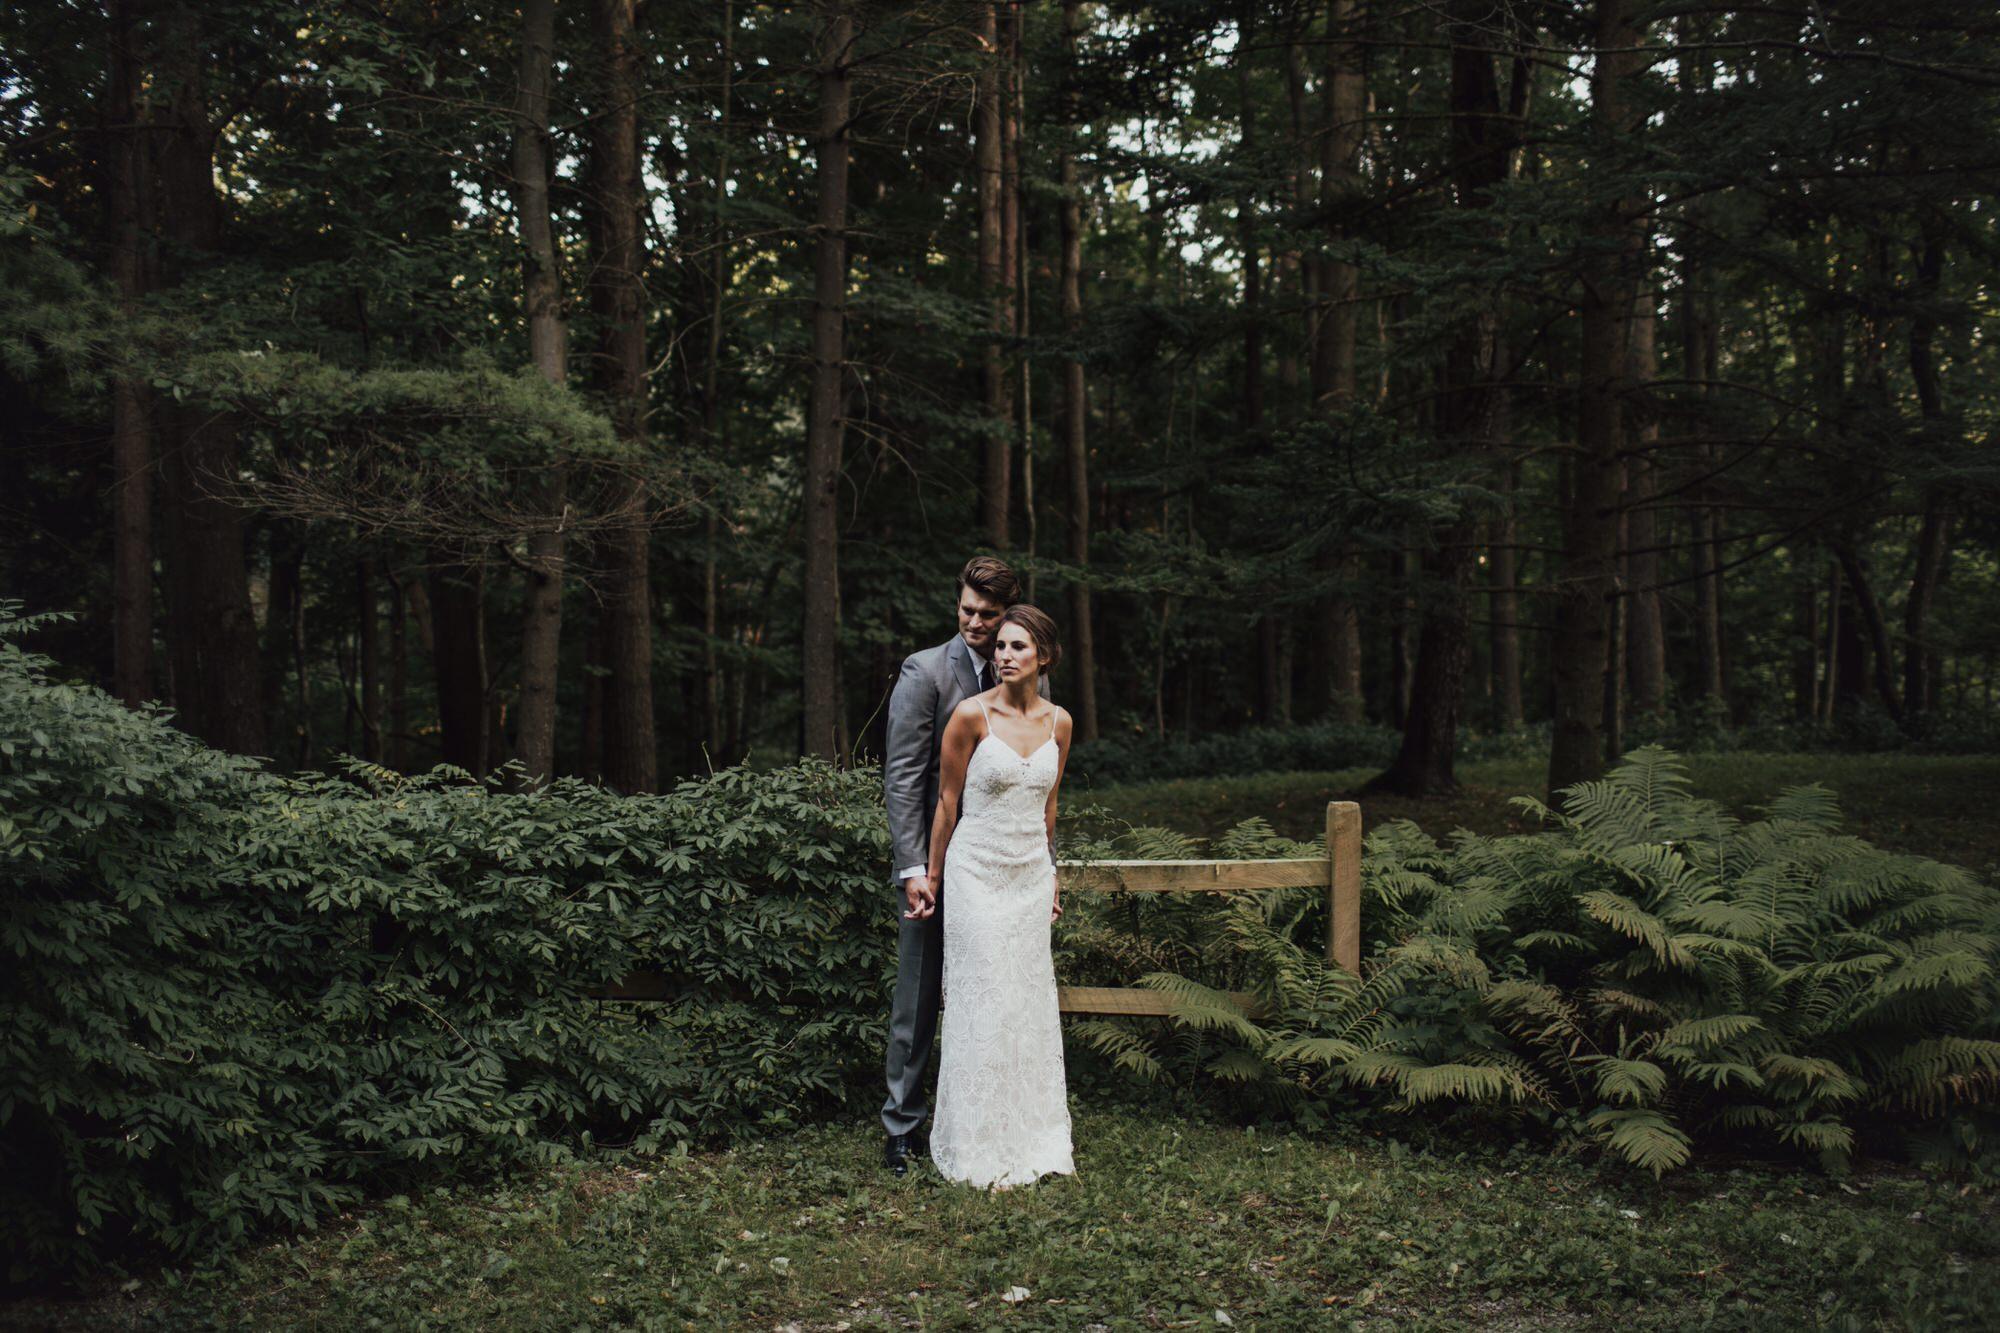 emily-aaron-rochester-new-york-wedding-photographer-102.JPG